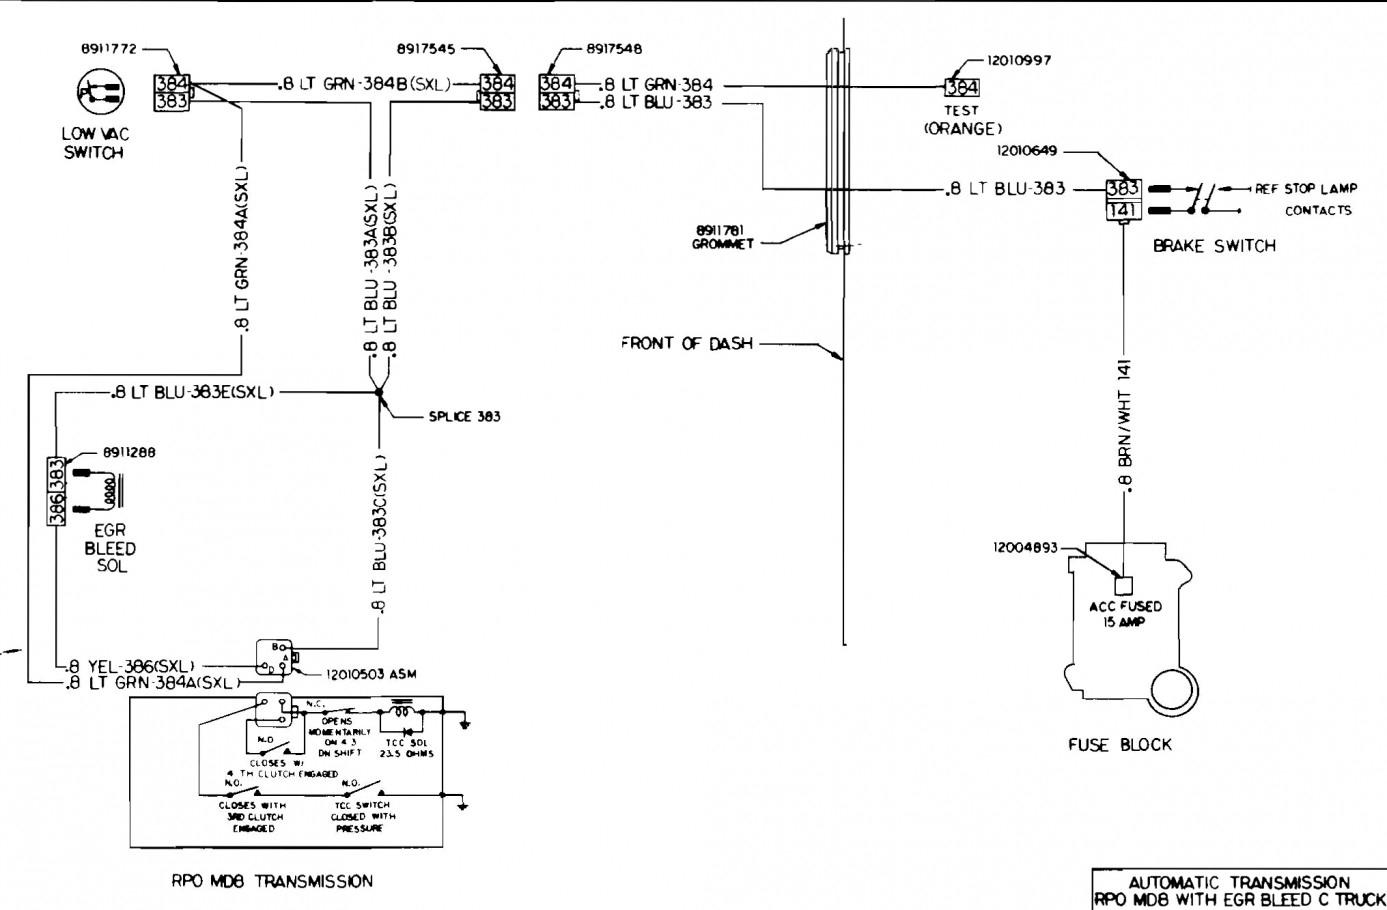 700R4 Wiring Diagram Factory | Wiring Diagram - 700R4 Torque Converter Lockup Wiring Diagram